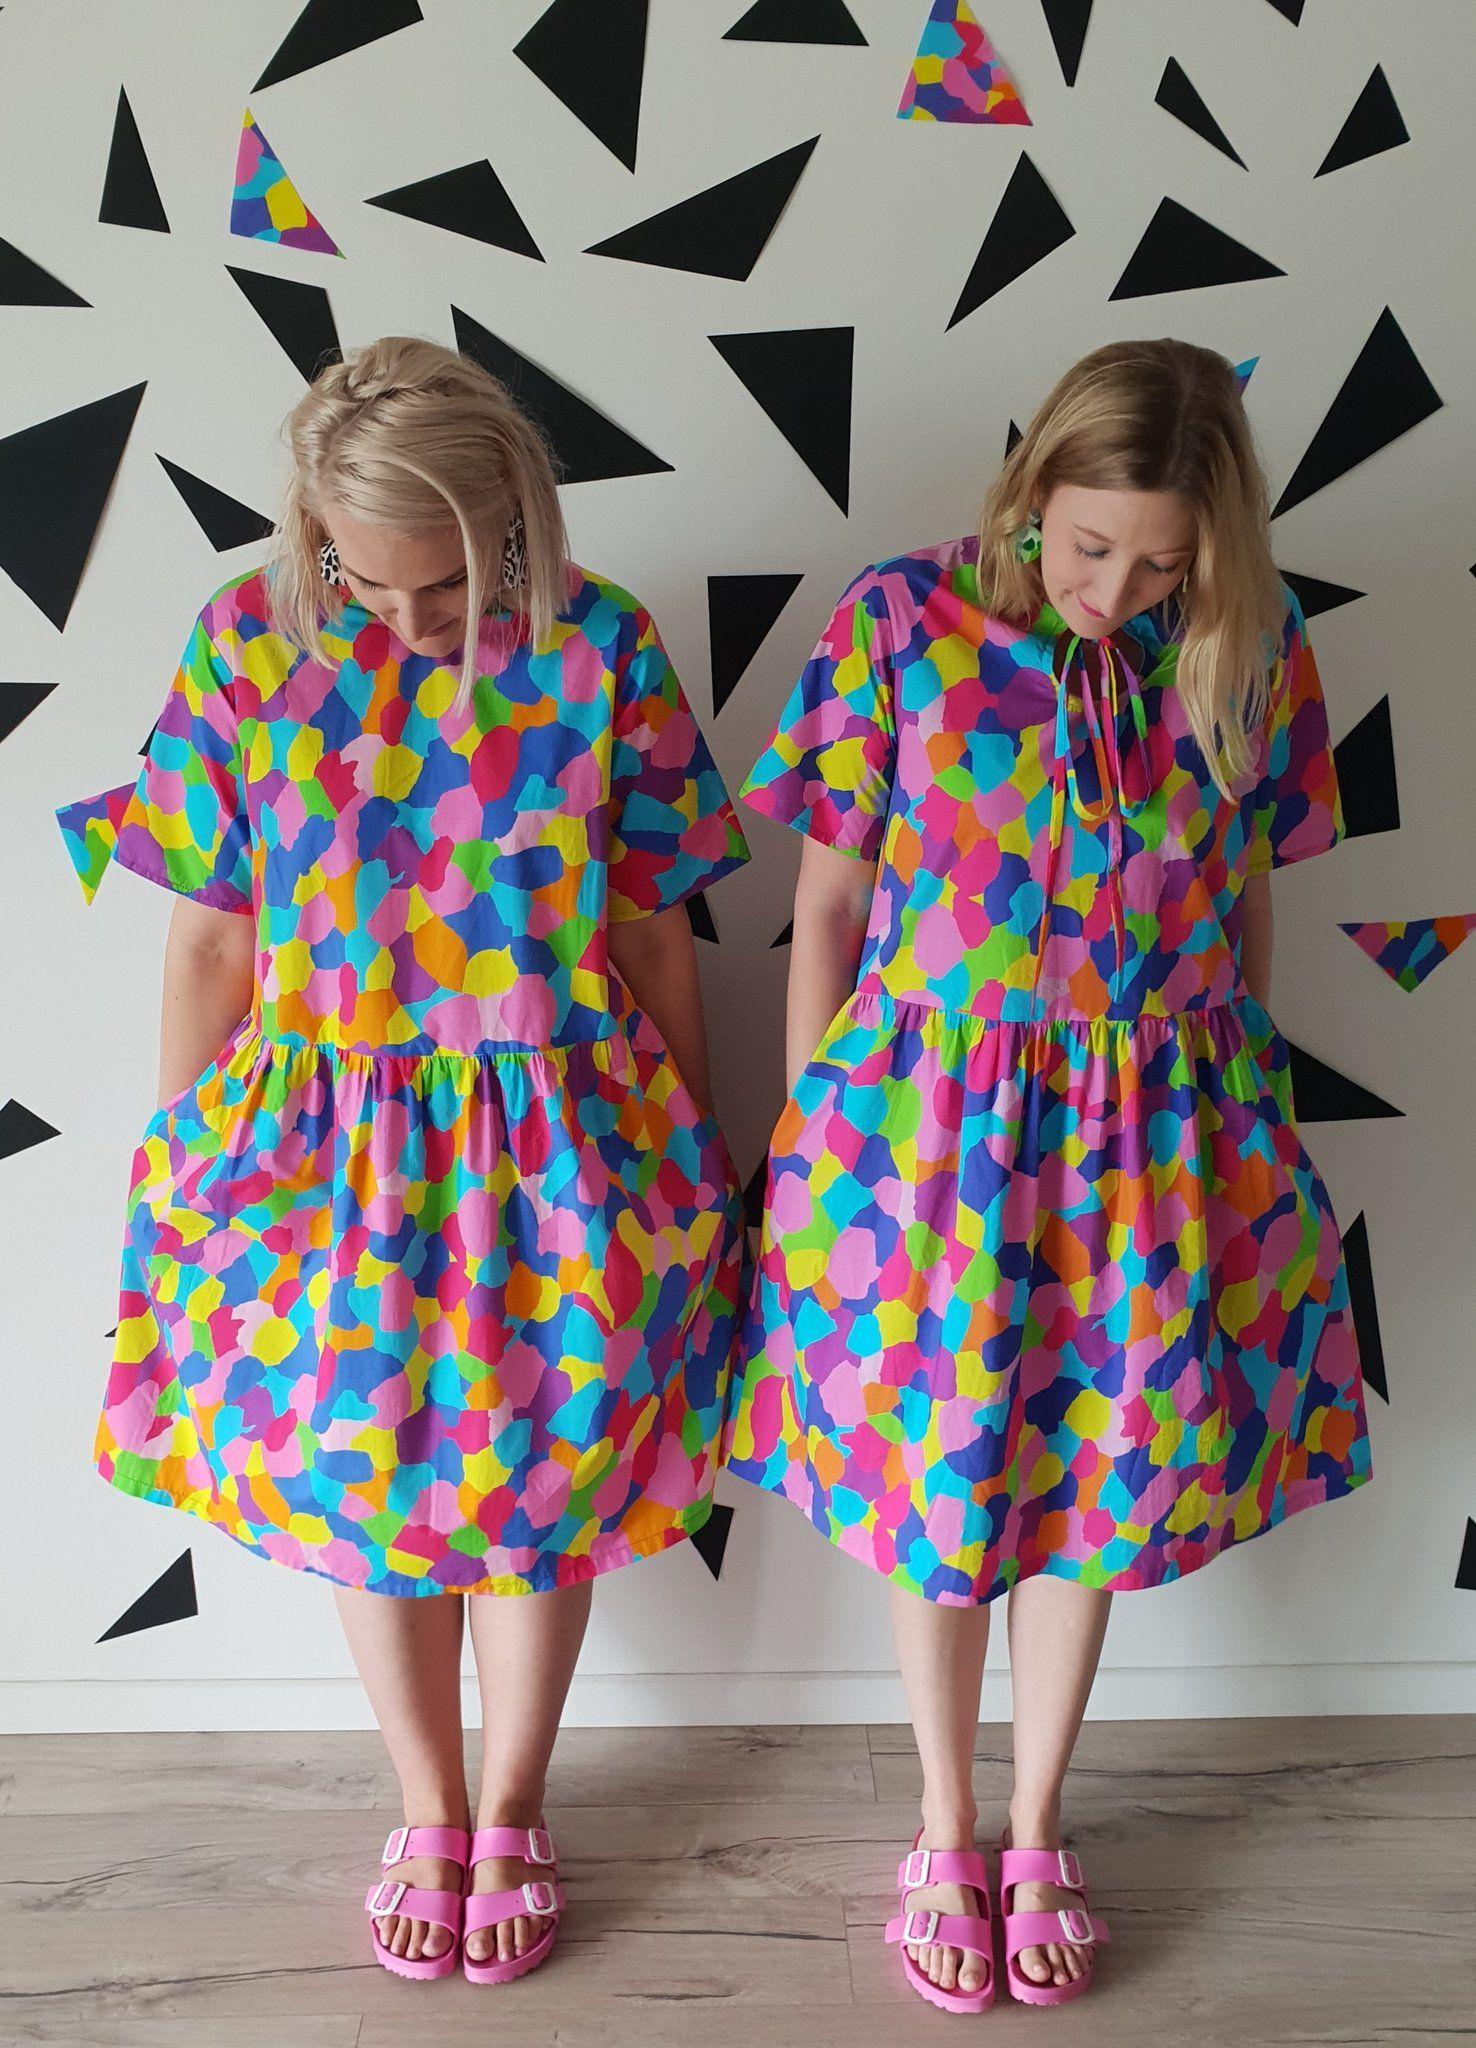 Rainbow Splash Smock Dress Meg Makes Studio Colourful Outfits Fabulous Dresses Lover Dress